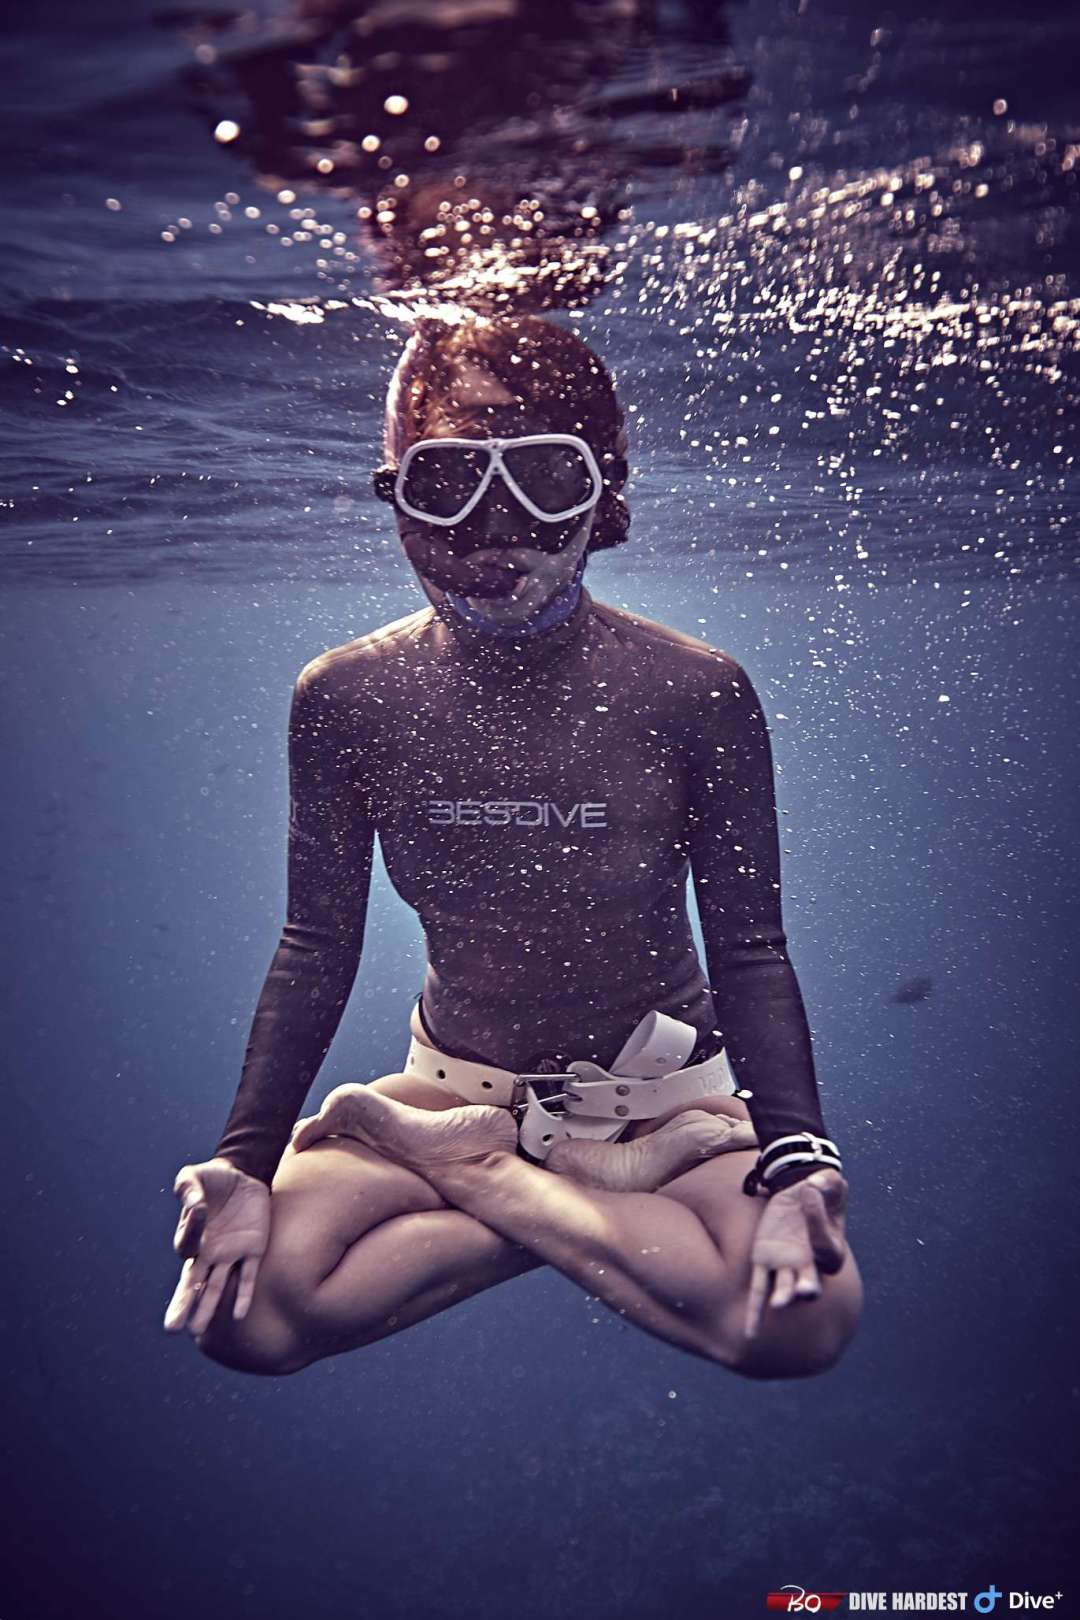 Dive+潜水员cocorococo的精彩瞬间